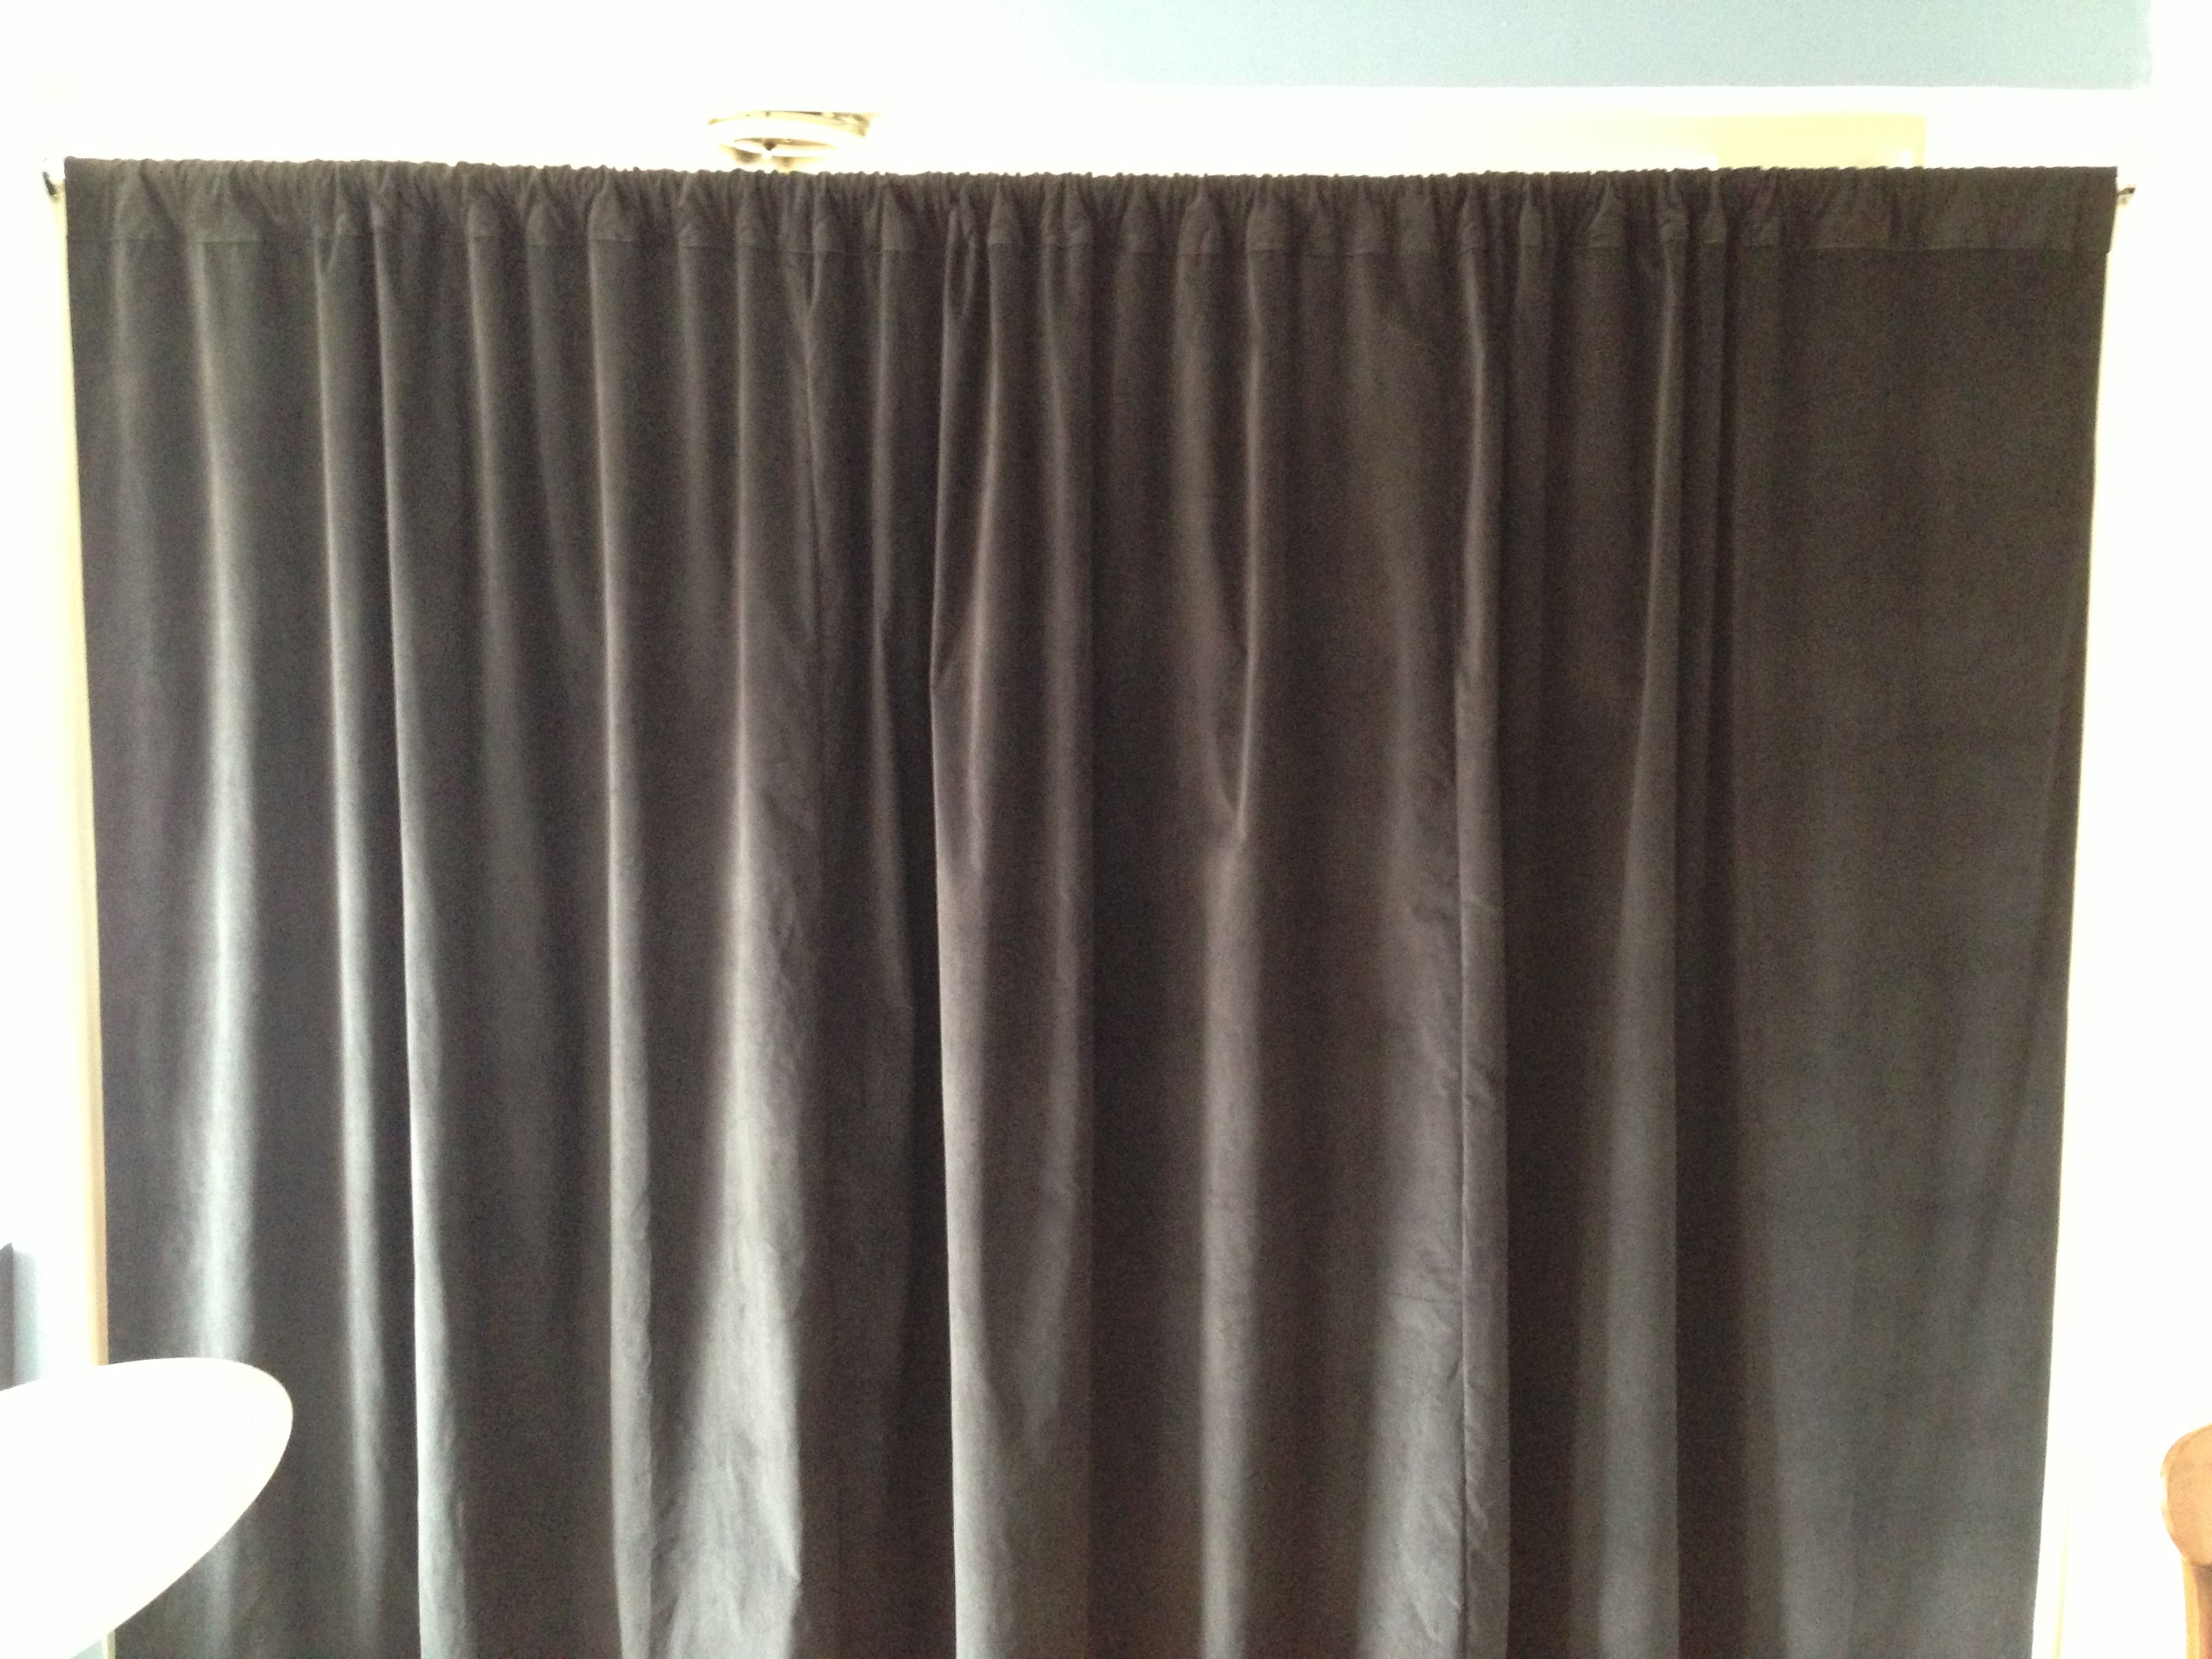 Black Velvet Curtain Soundproofing Room Divider Curtains Living